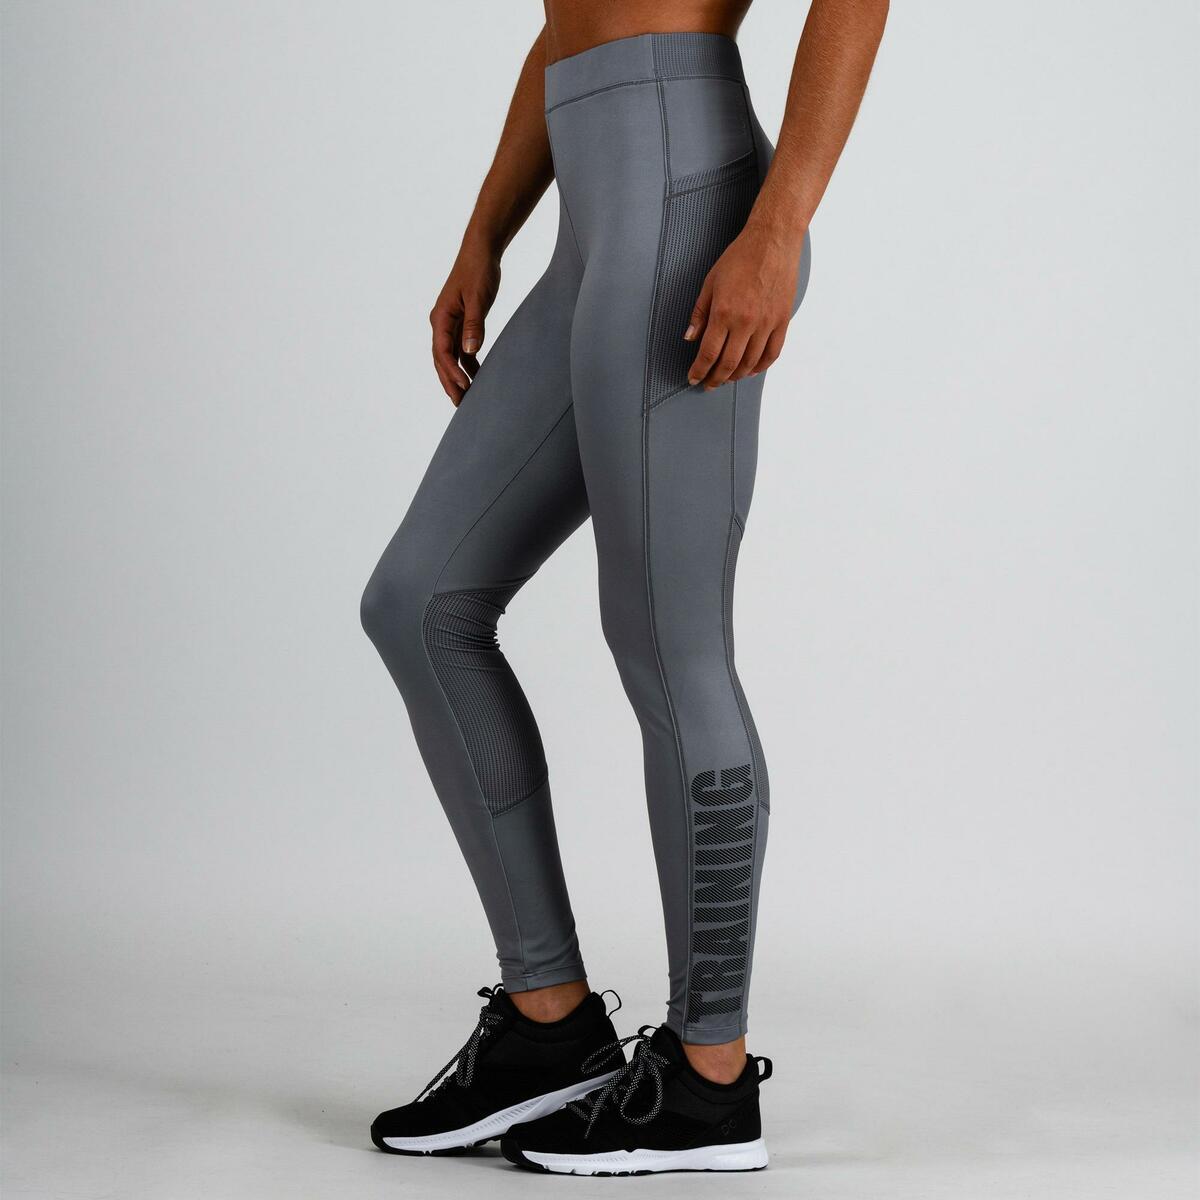 Bild 4 von Leggings FTI 120 Fitness Cardio Damen grau